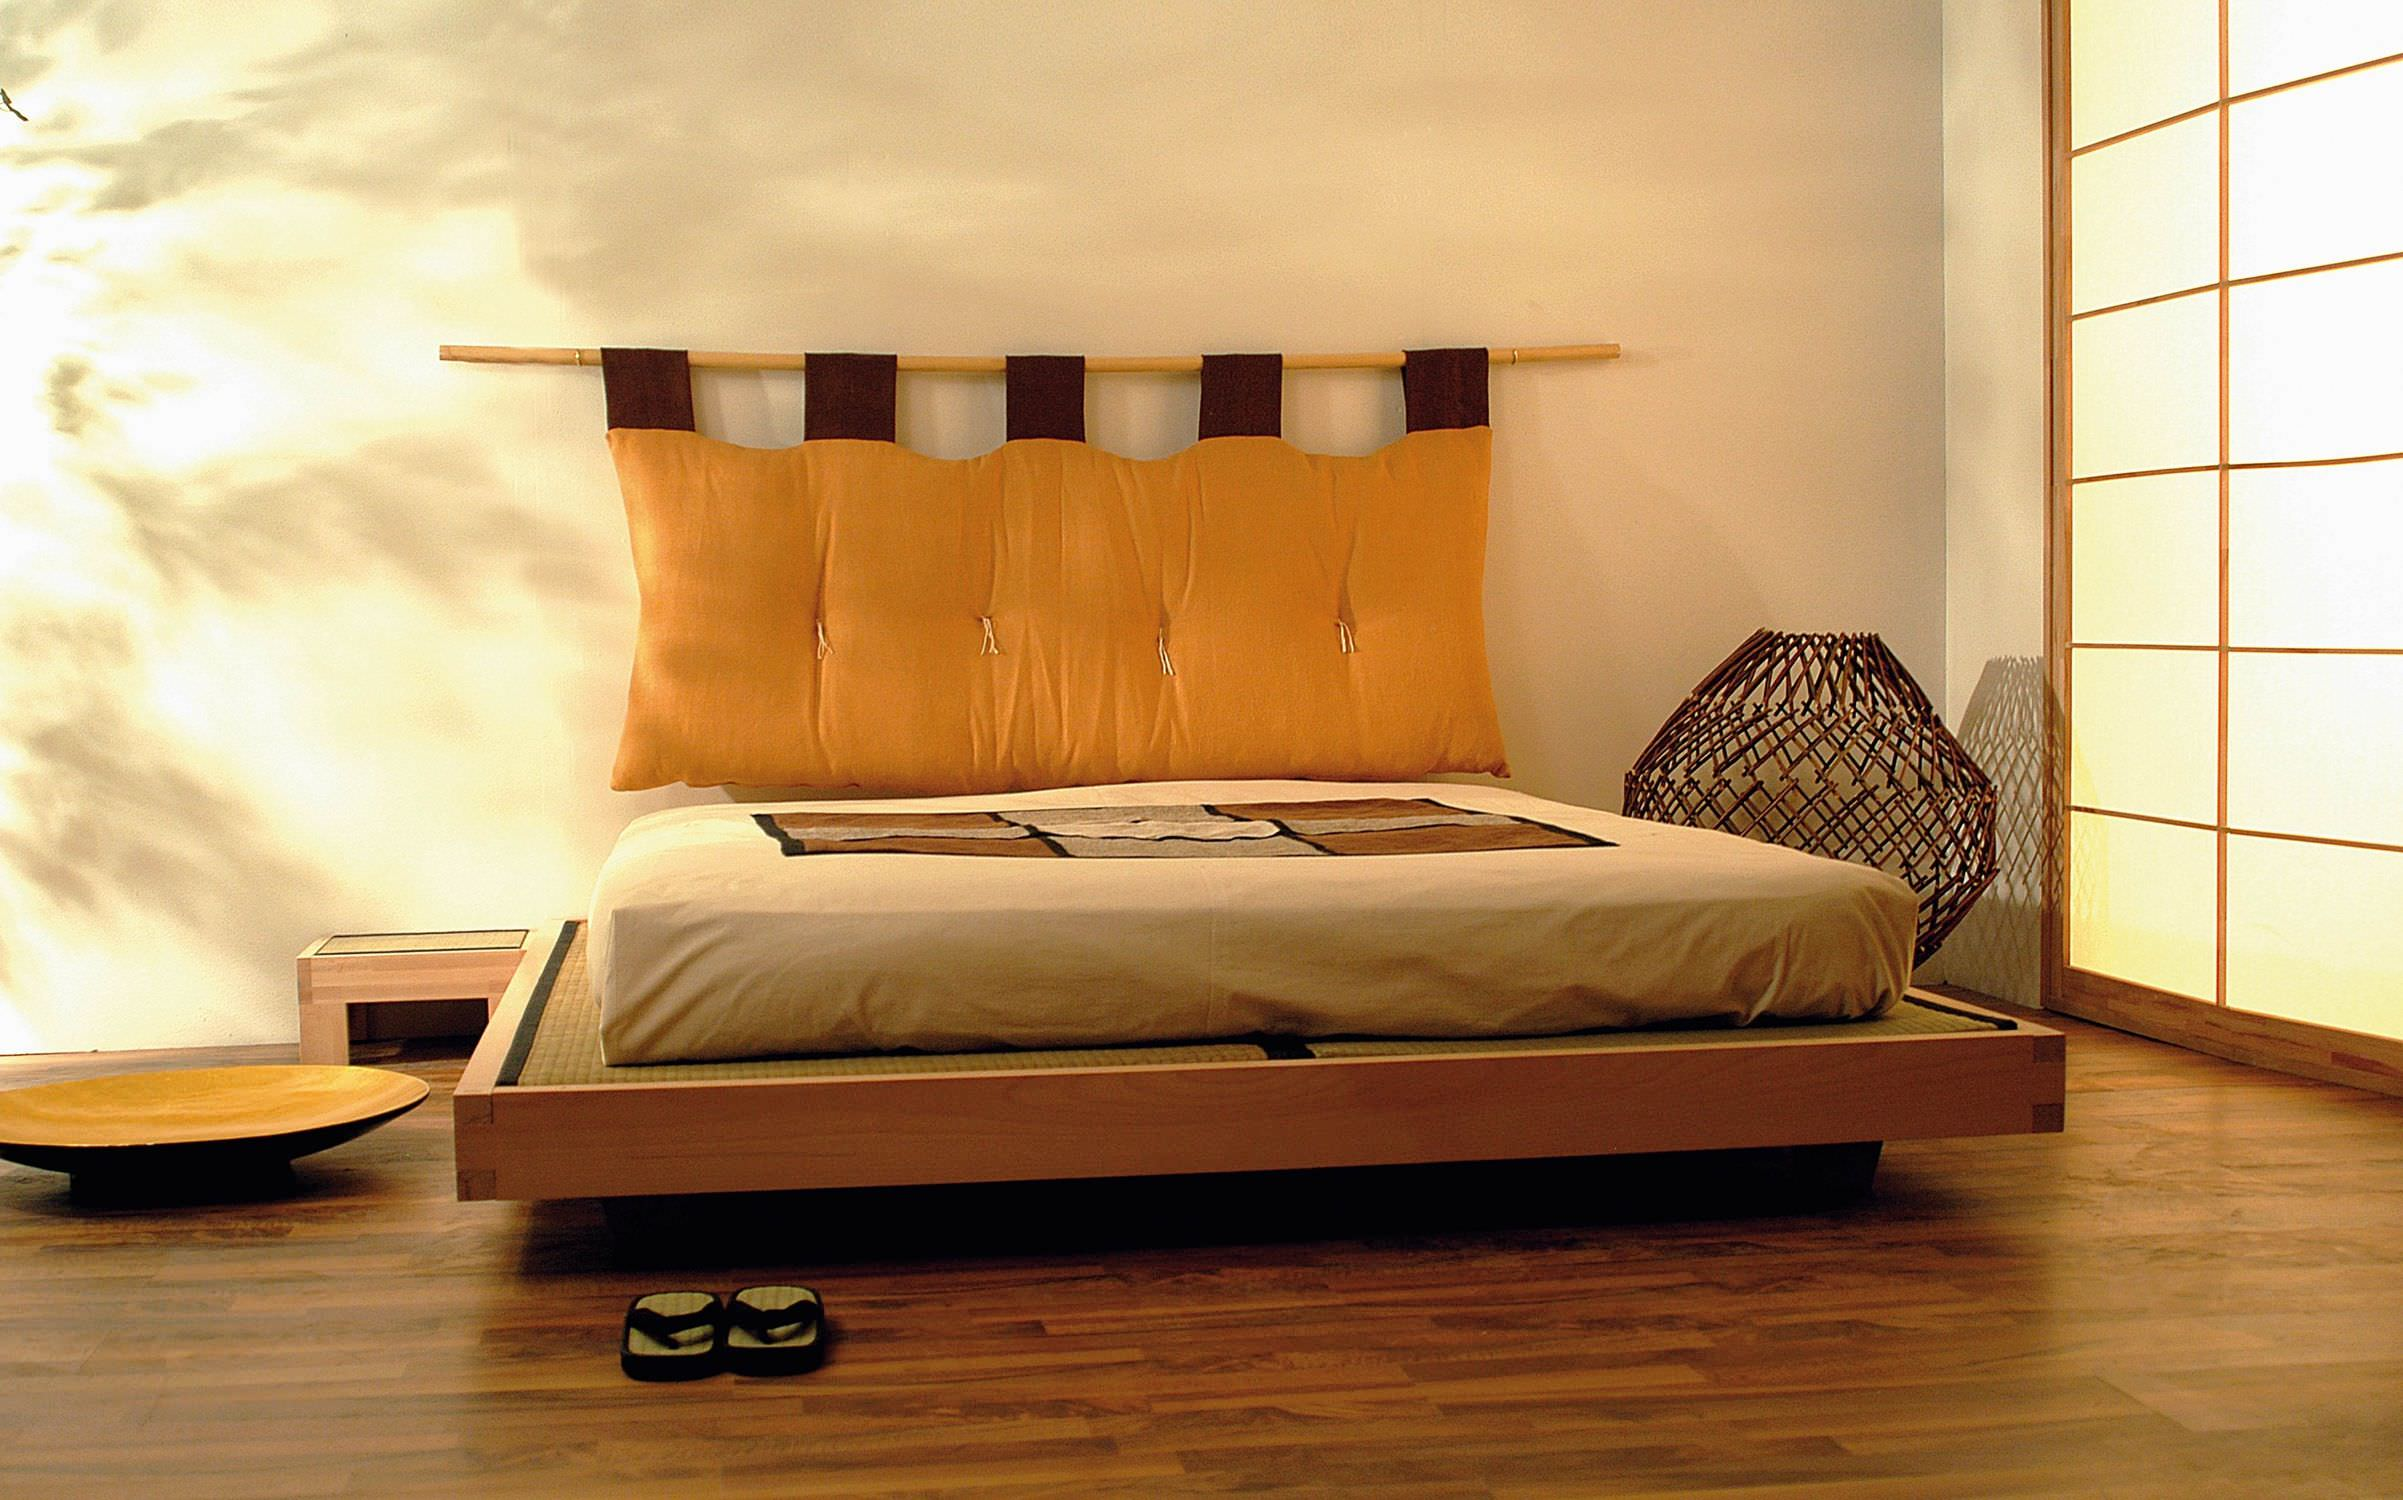 Full Size of Tatami Bett Doppelbett Modern Holz Luna Cinius Chesterfield Massiv 180x200 120x200 Mit Matratze Und Lattenrost Wohnwert Betten Kiefer 90x200 Aufbewahrung Bett Tatami Bett